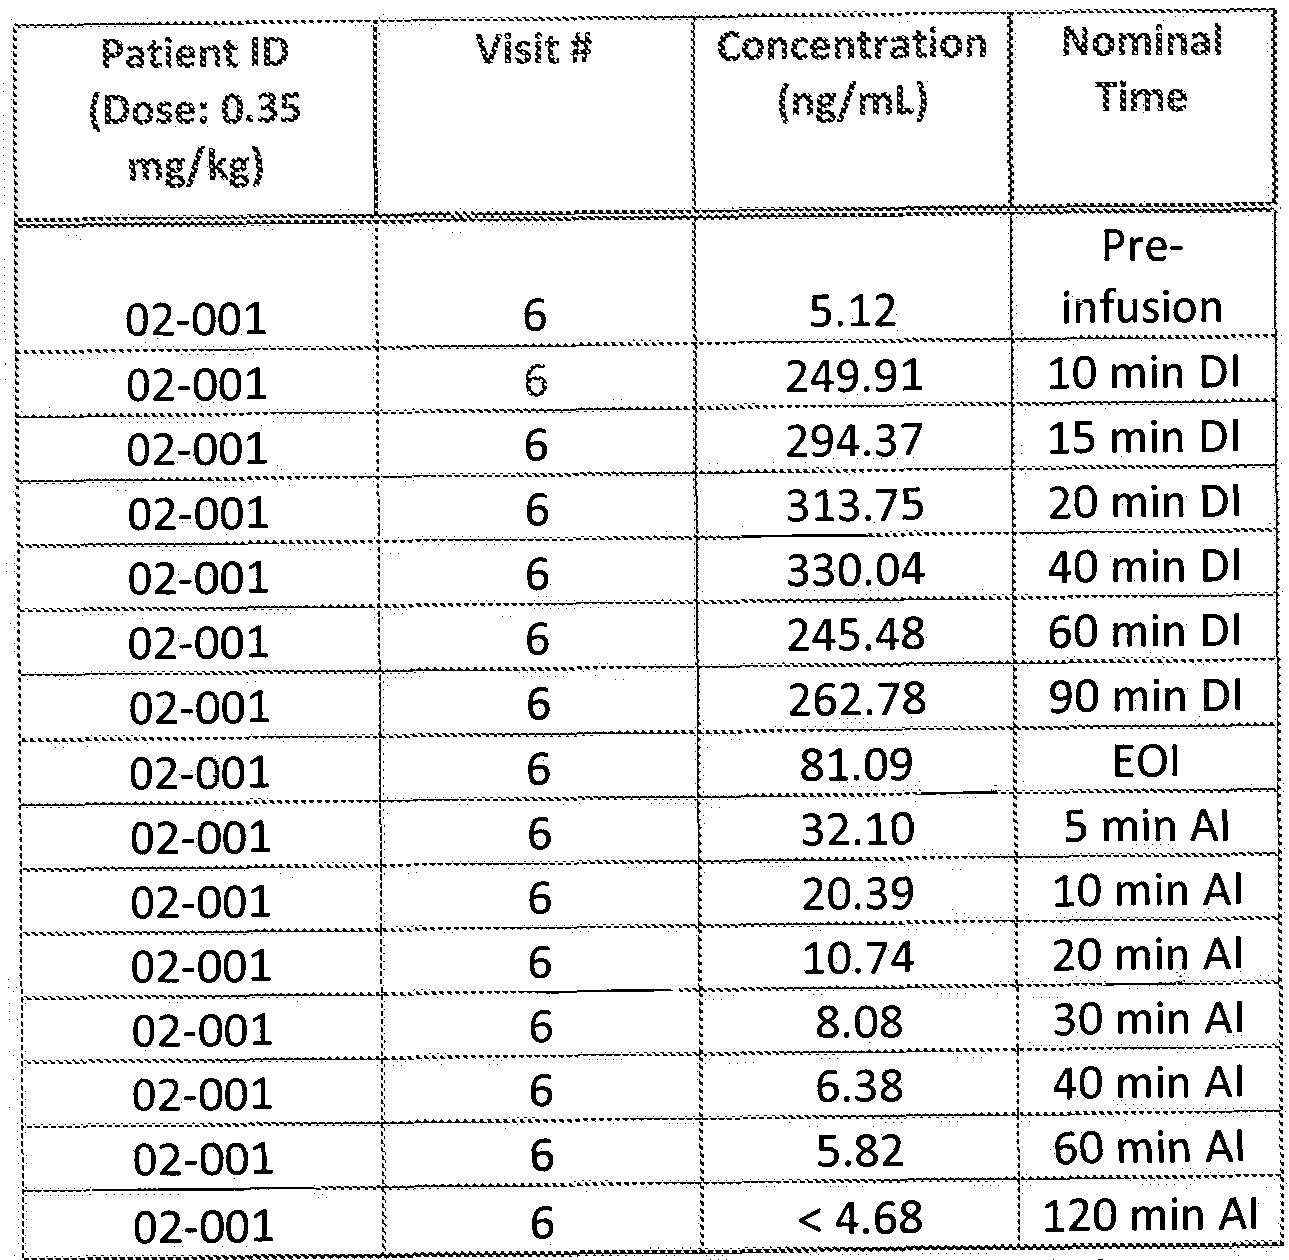 WO2012050695A1 - Use of lysosomal acid lipase for treating lysosomal